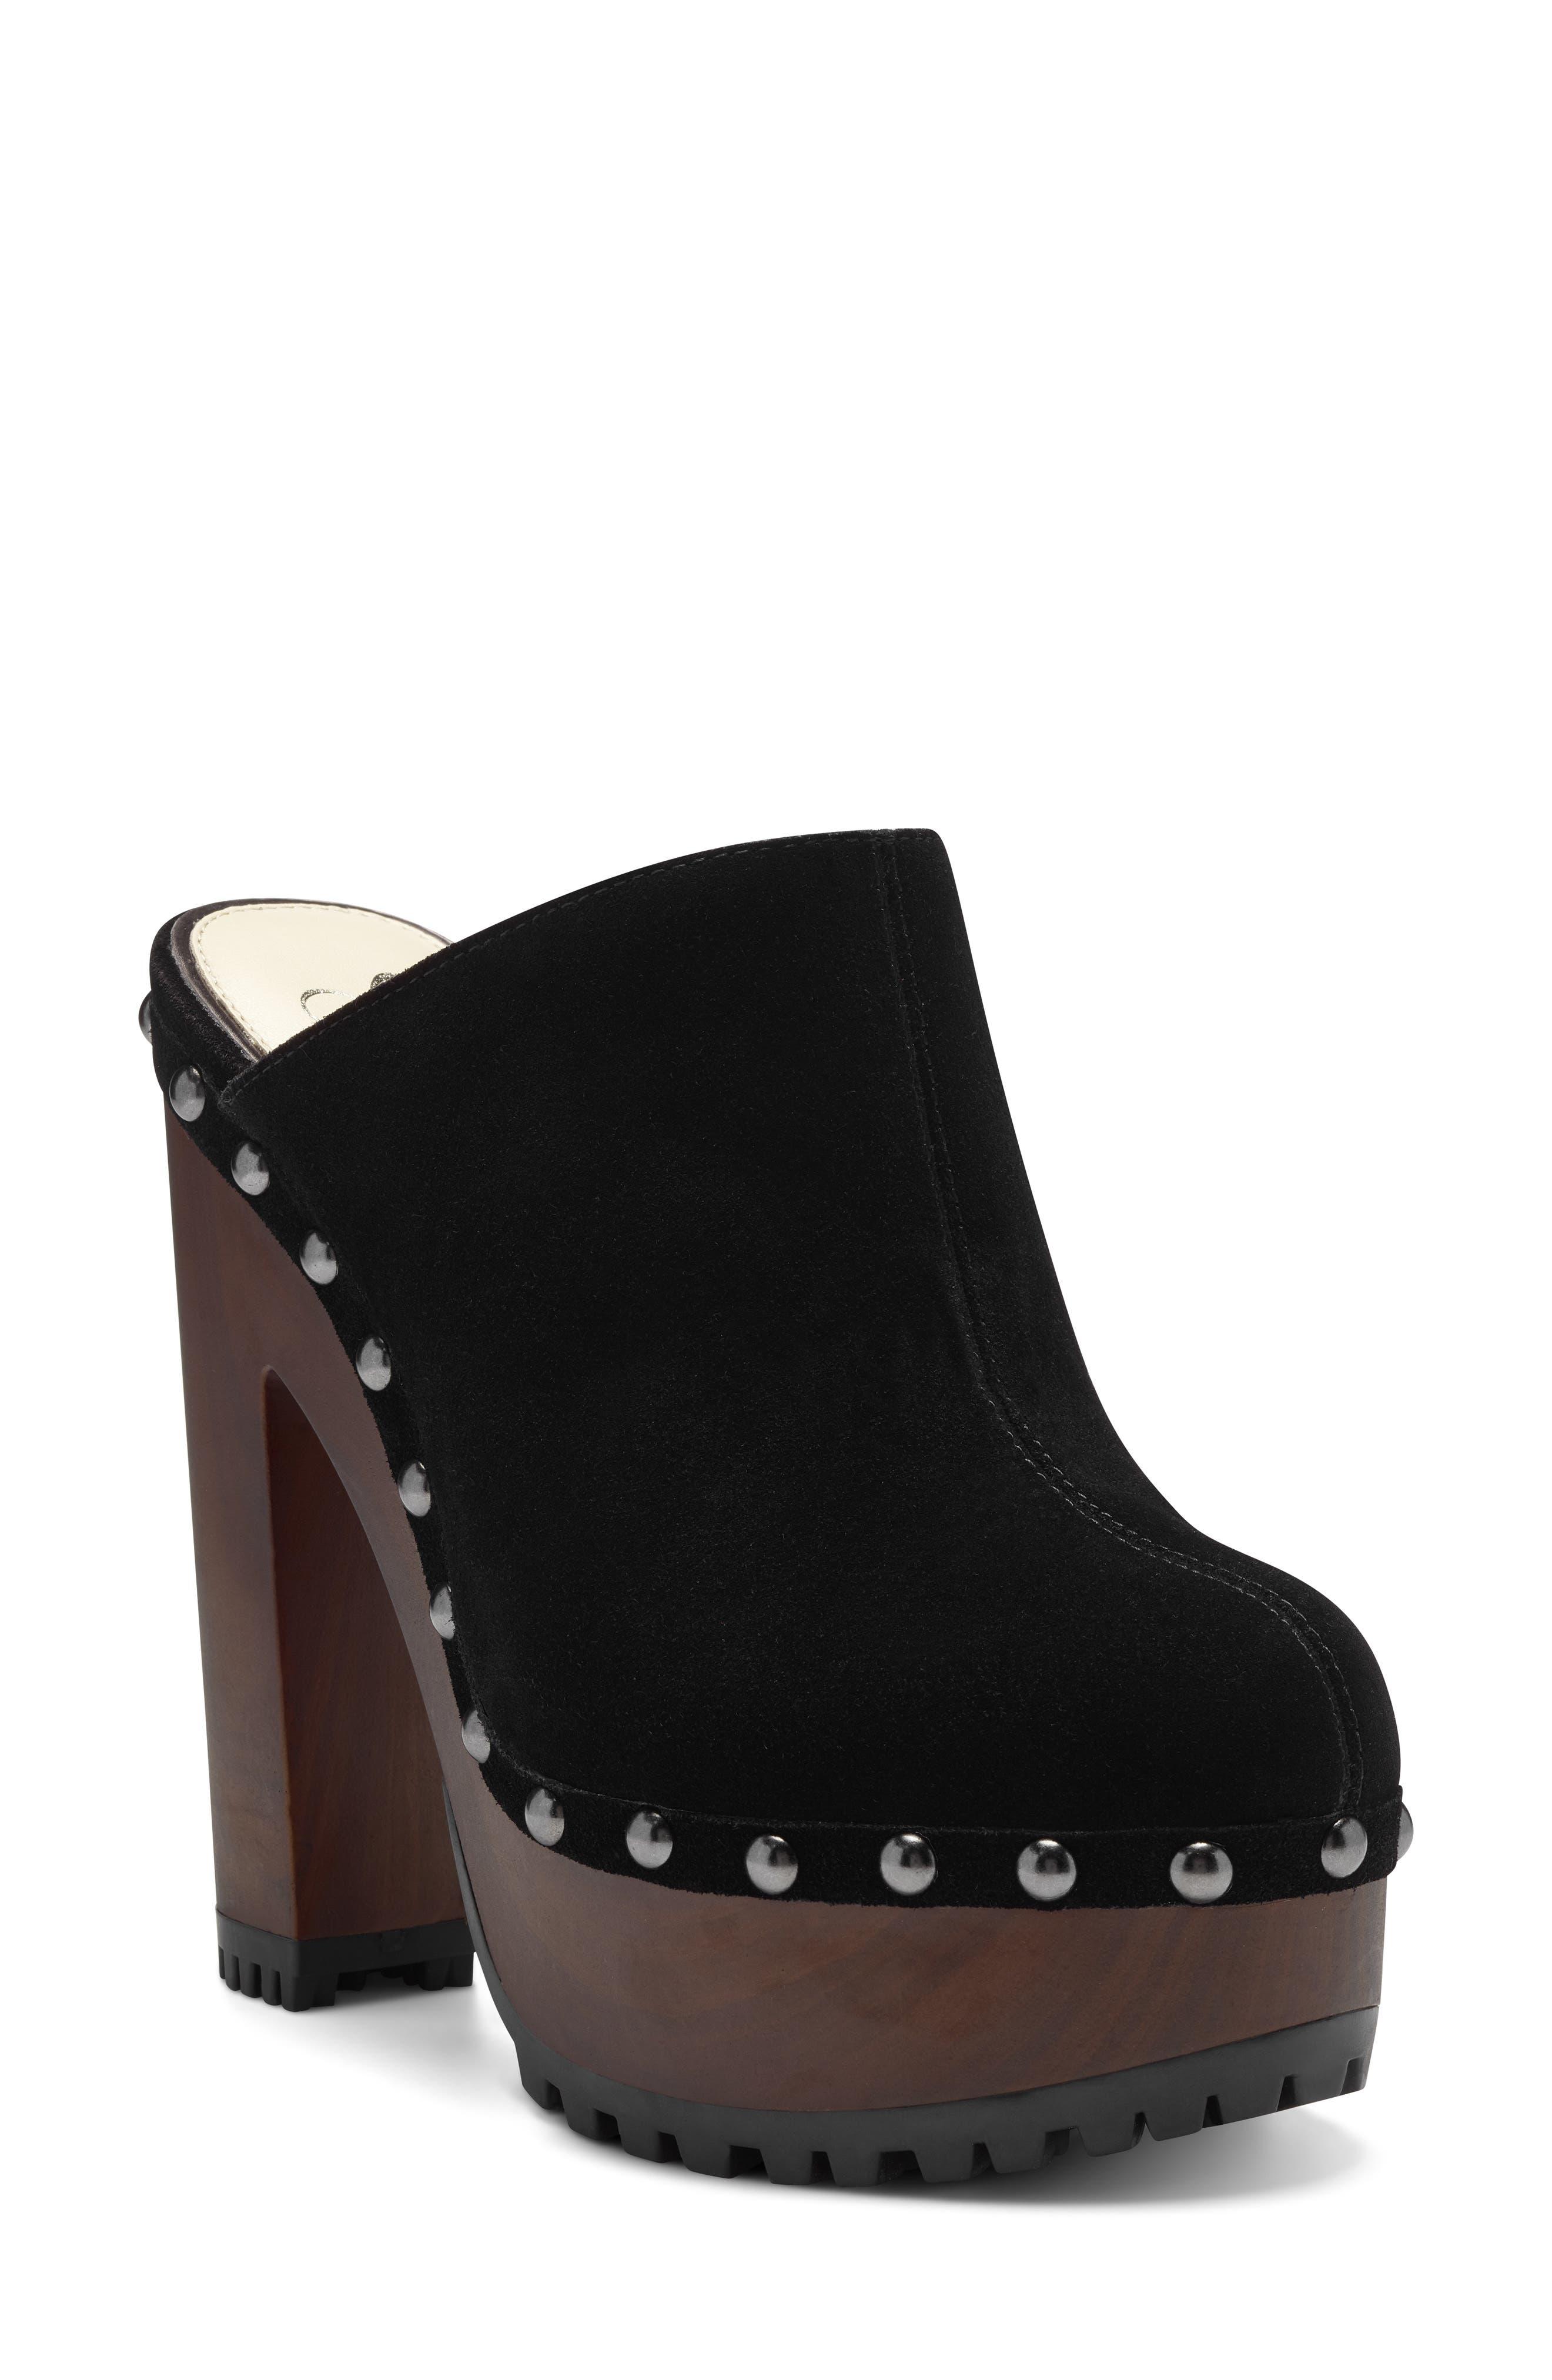 Clogs Jessica Simpson Shoes | Nordstrom